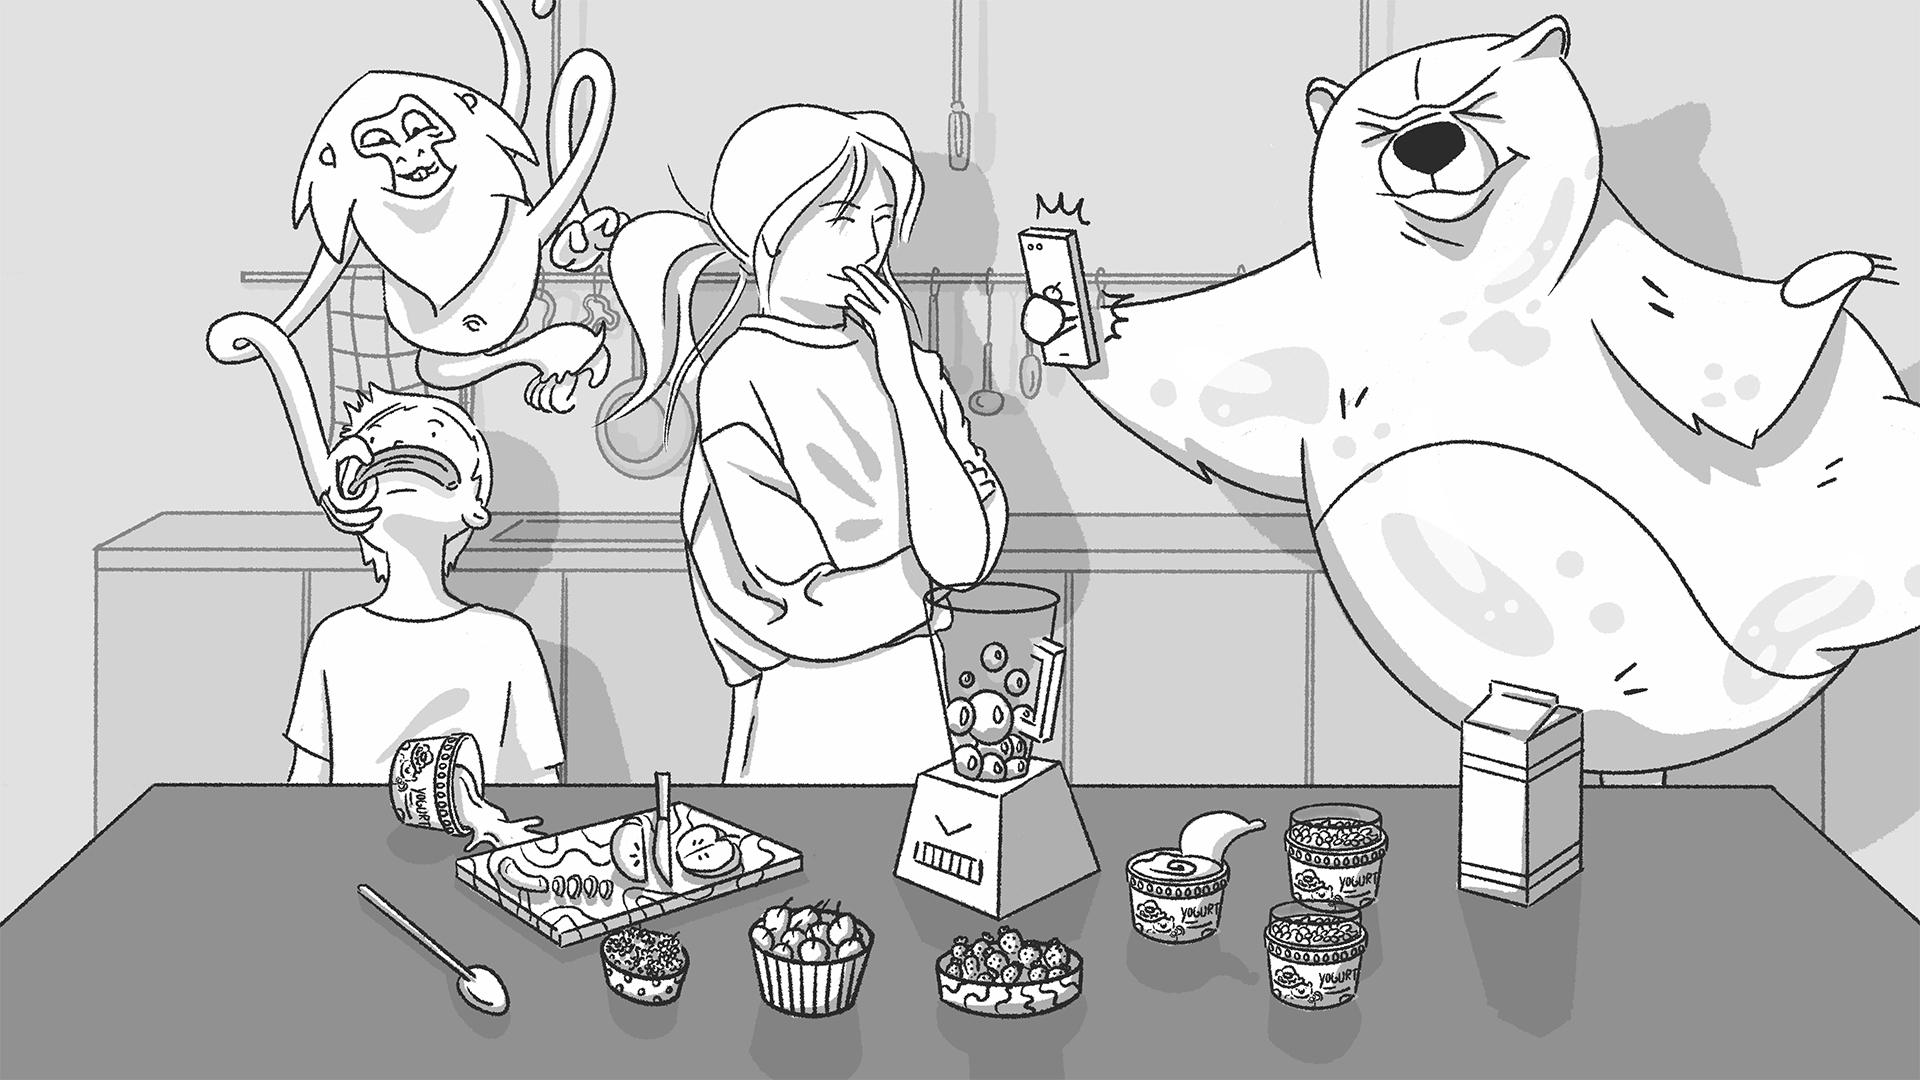 Arla_Storyboard_08